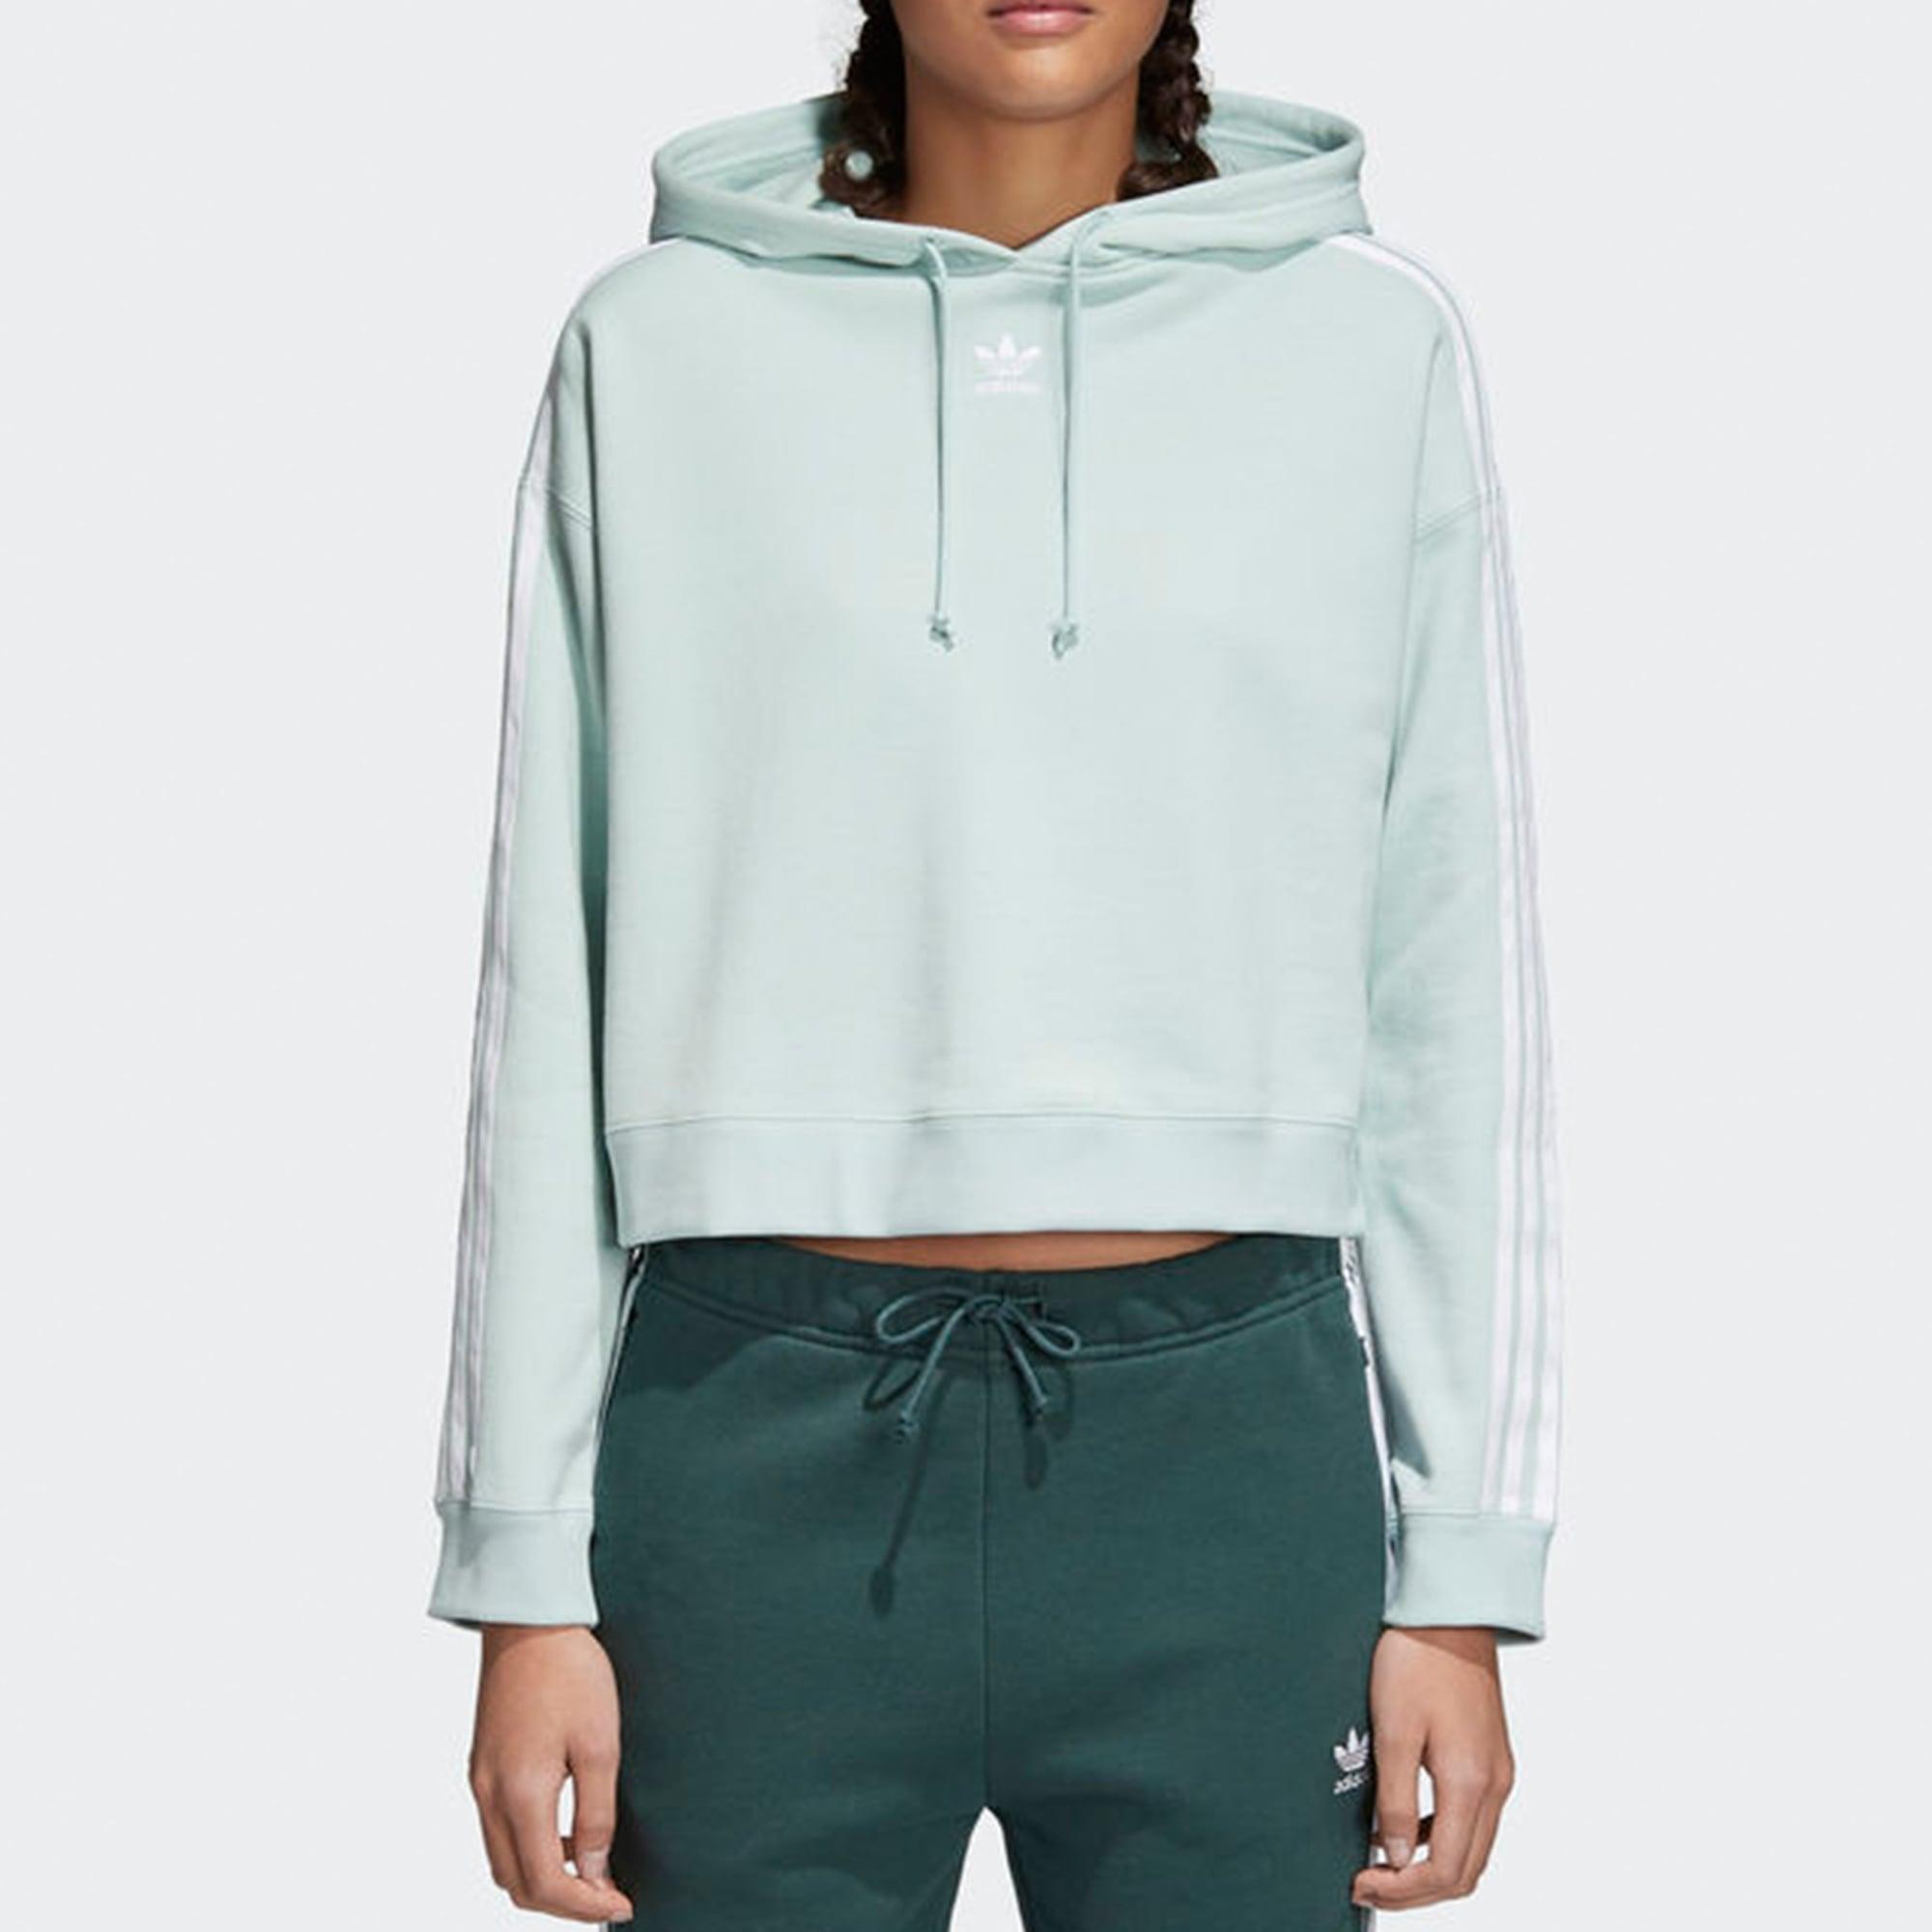 b4dd72b55c8 Adidas Originals Womens Cropped Hoodie